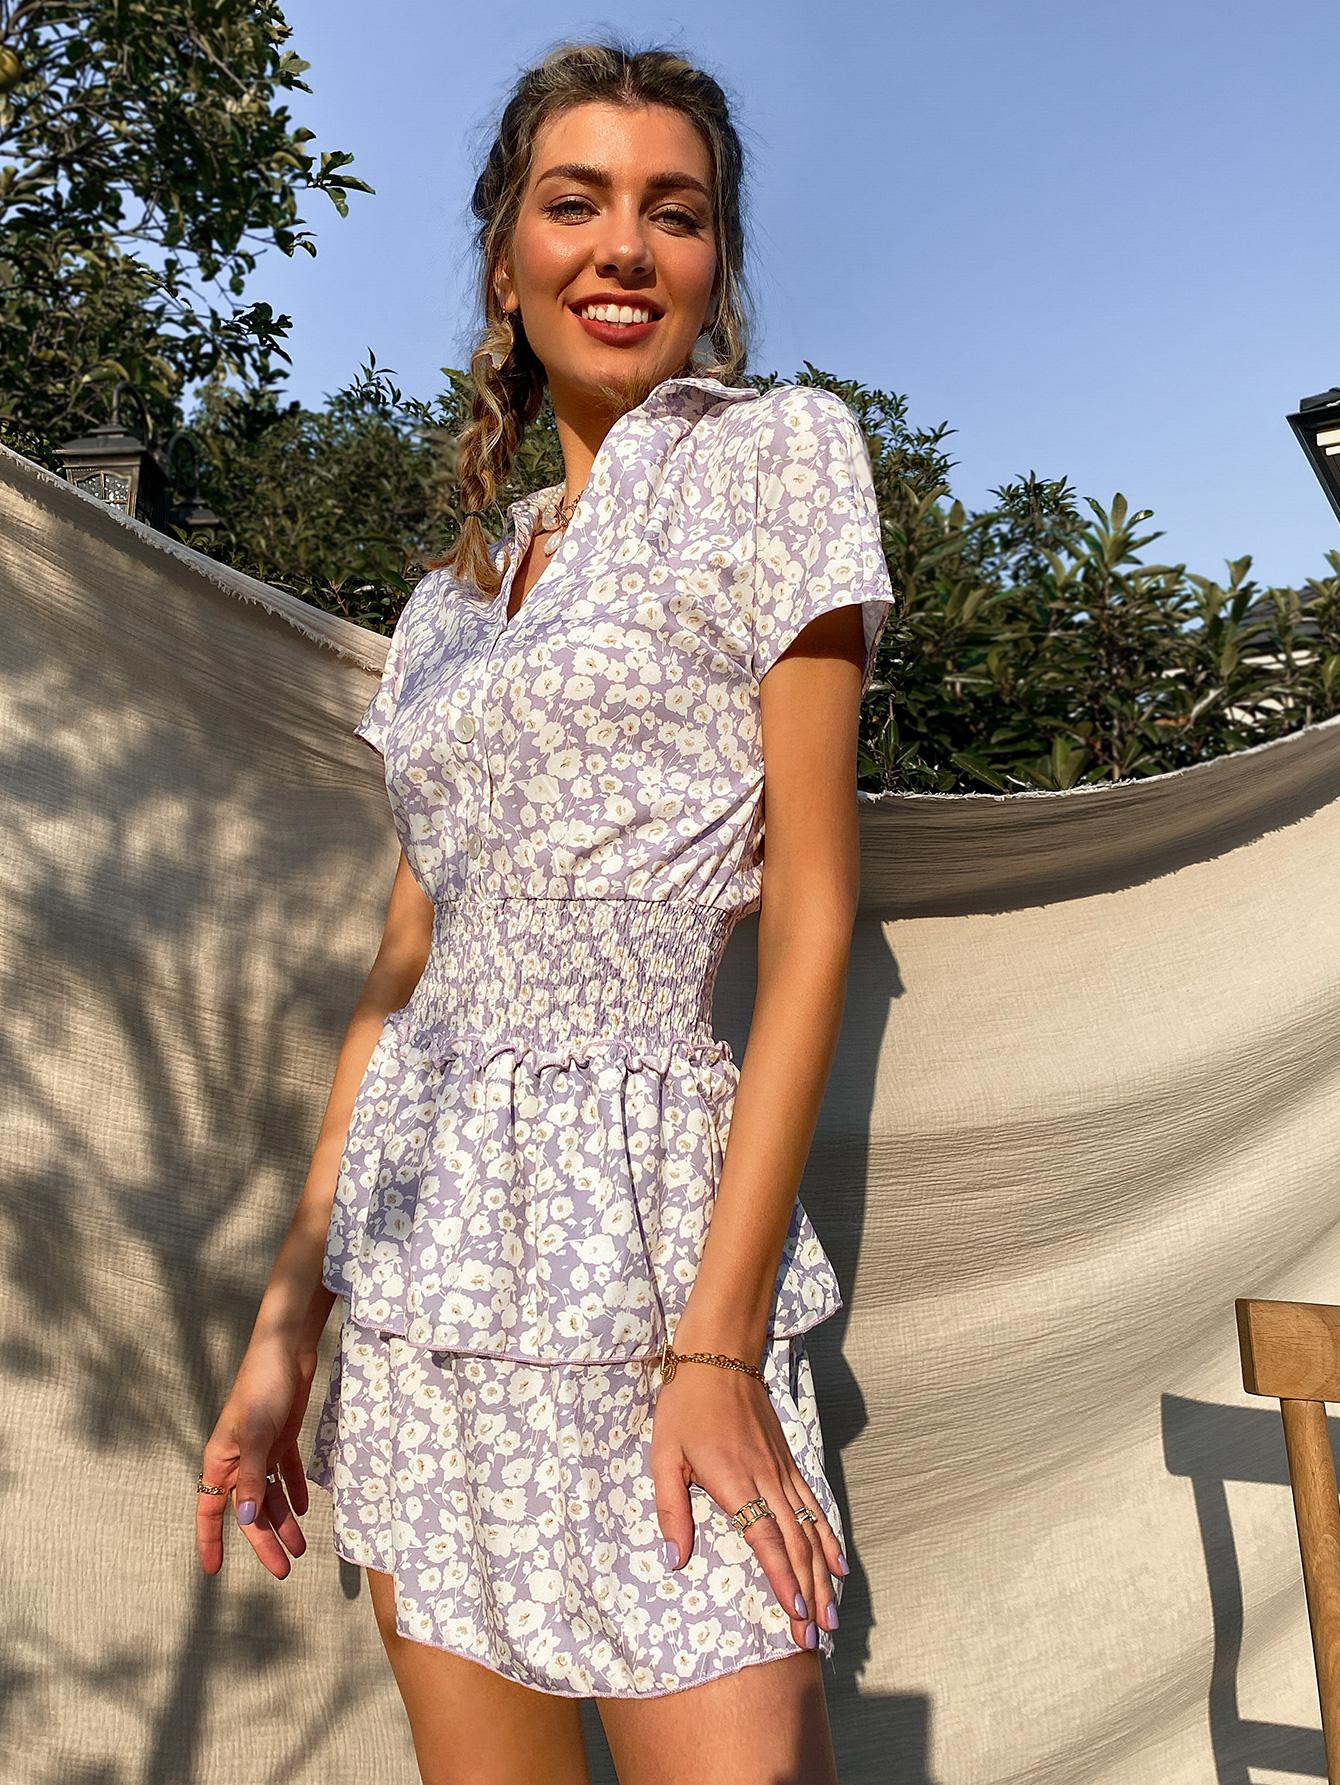 Fashion Lapel Short Sleeve Waist Floral Dress NHDE368483